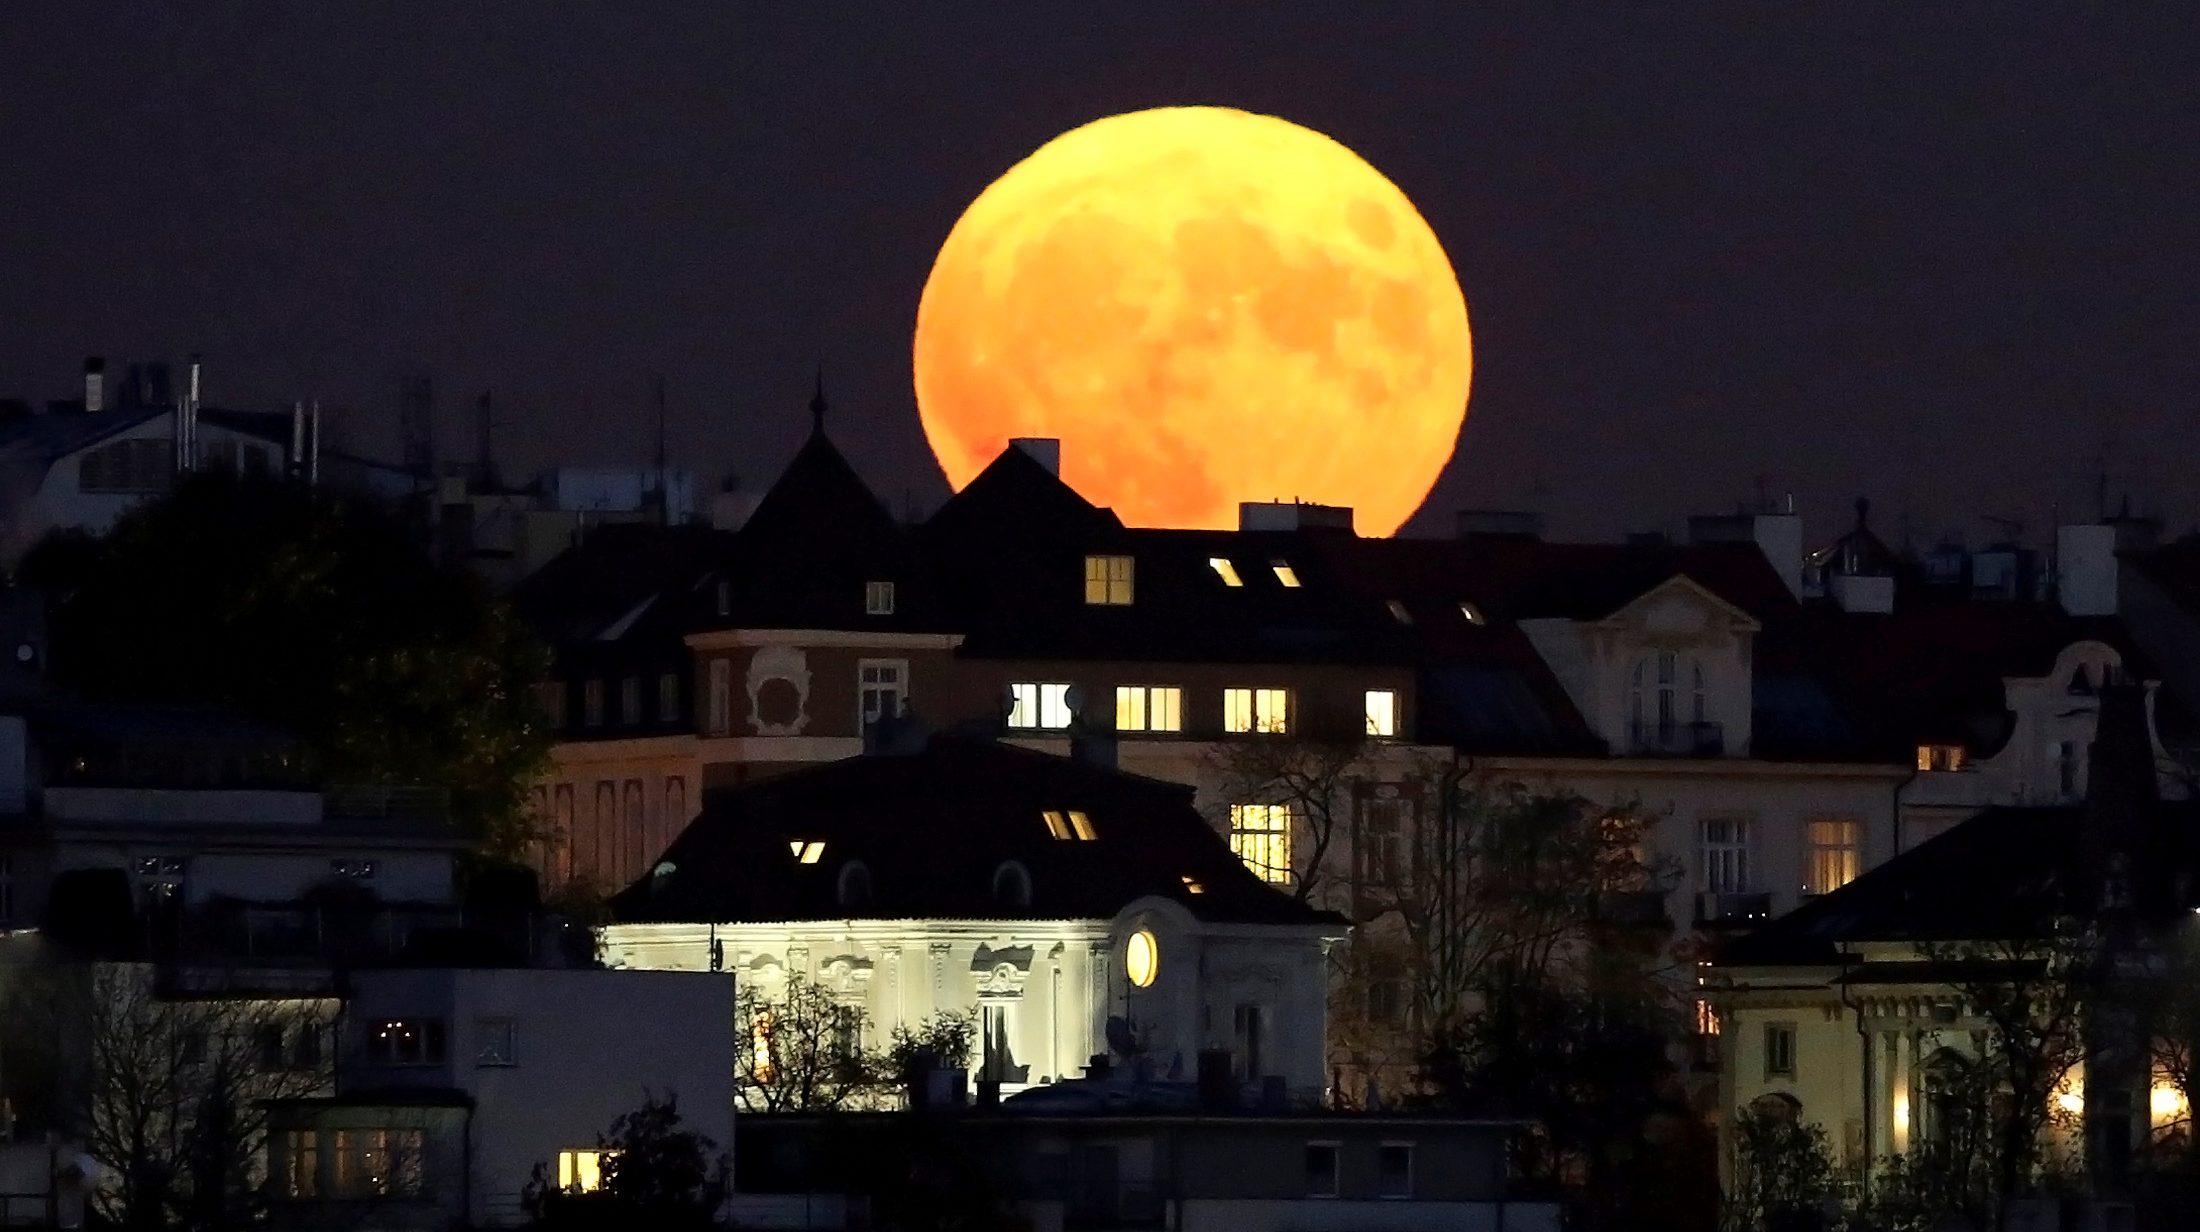 The supermoon rises in Prague, Czech Republic November 14, 2016.